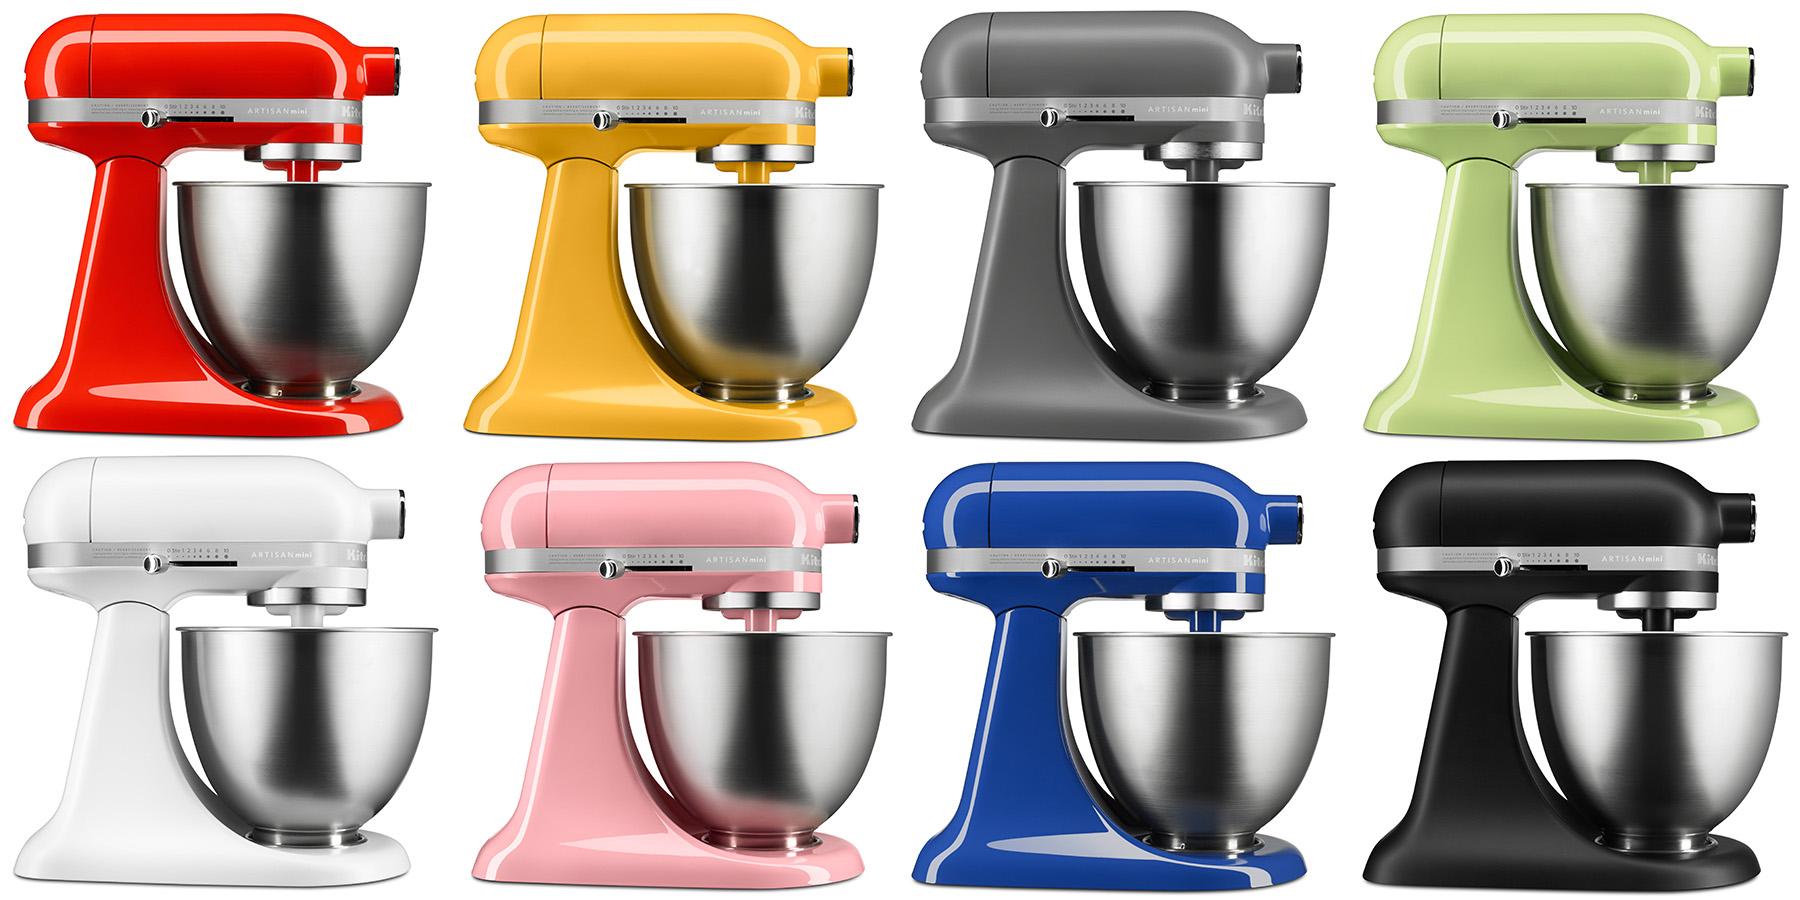 Kitchenaid Mini Stand Mixer Colors